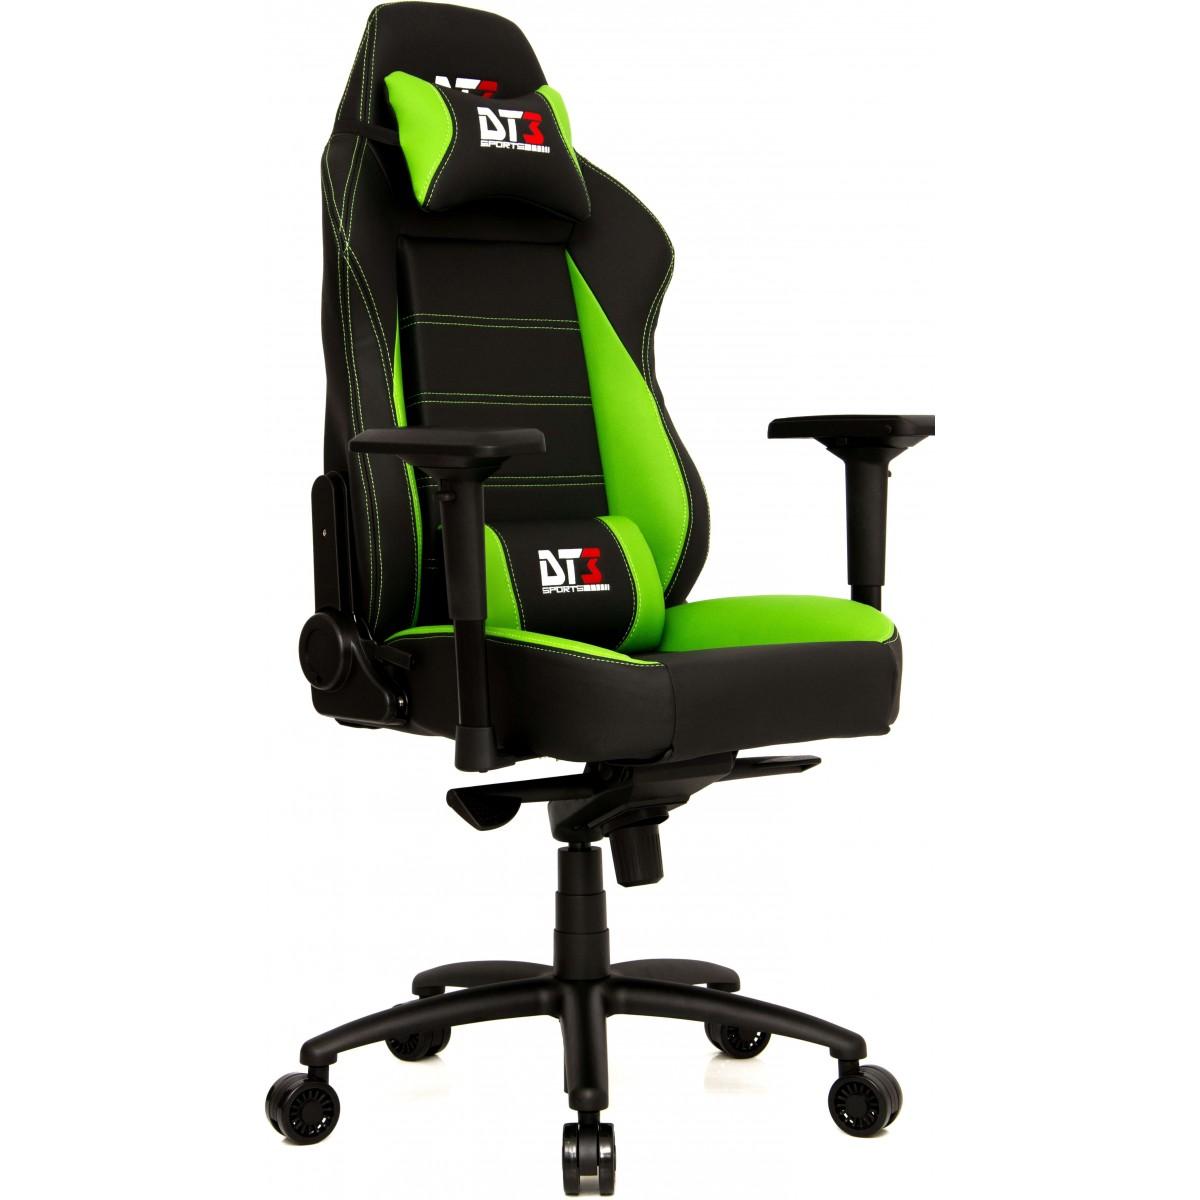 Cadeira Gamer DT3 Sports Orion Black Green